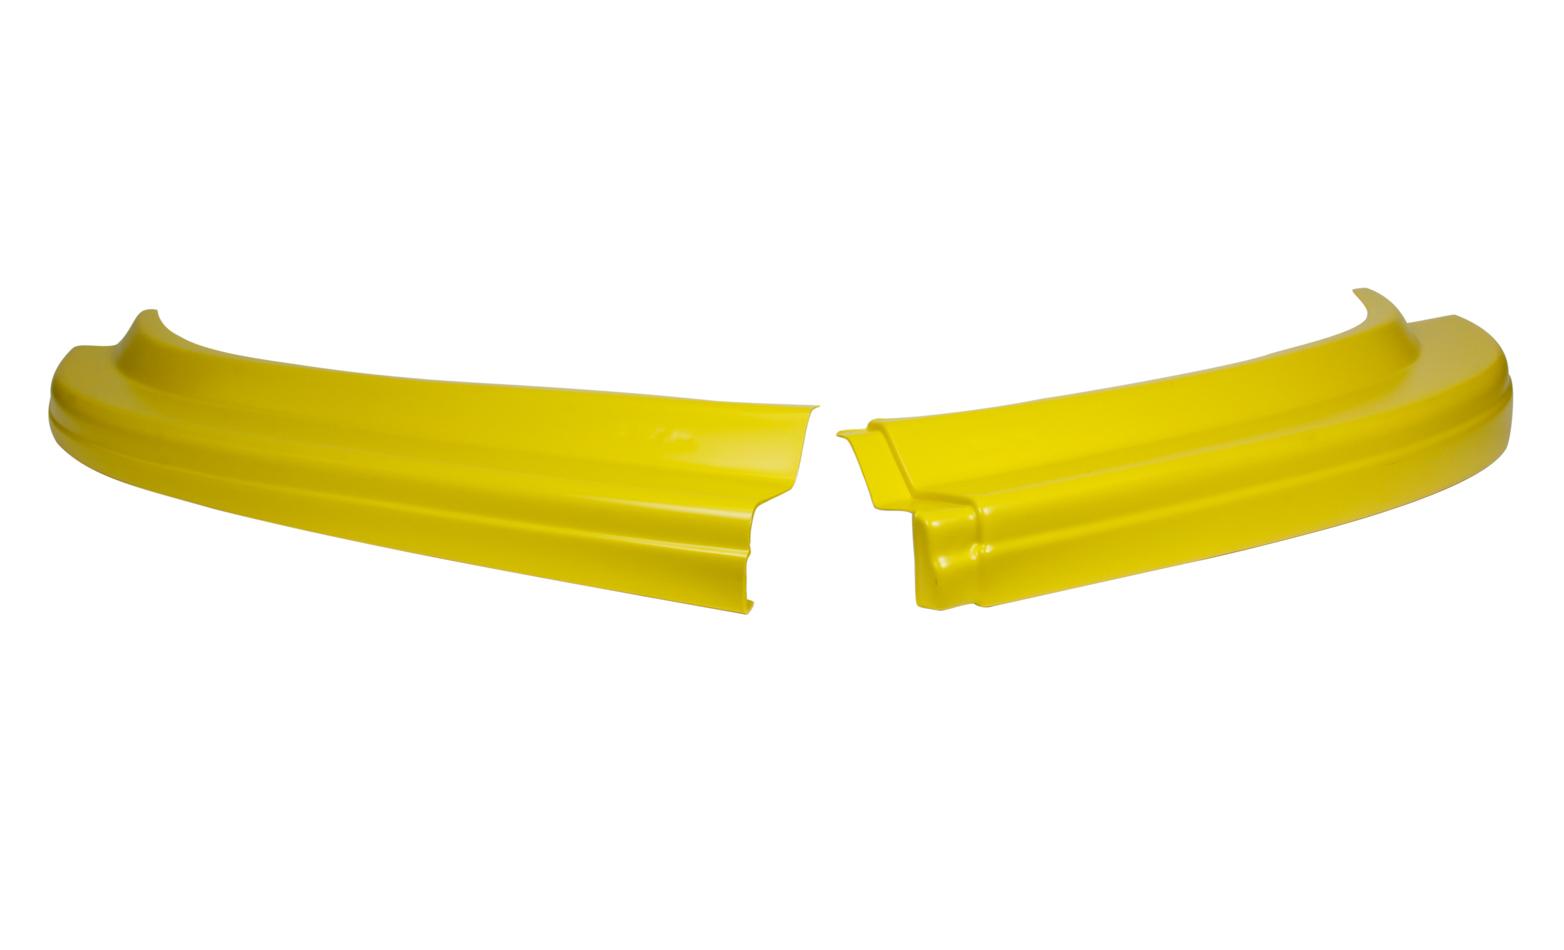 Fivestar Lower Valance MD3 Evo II DLM Yellow